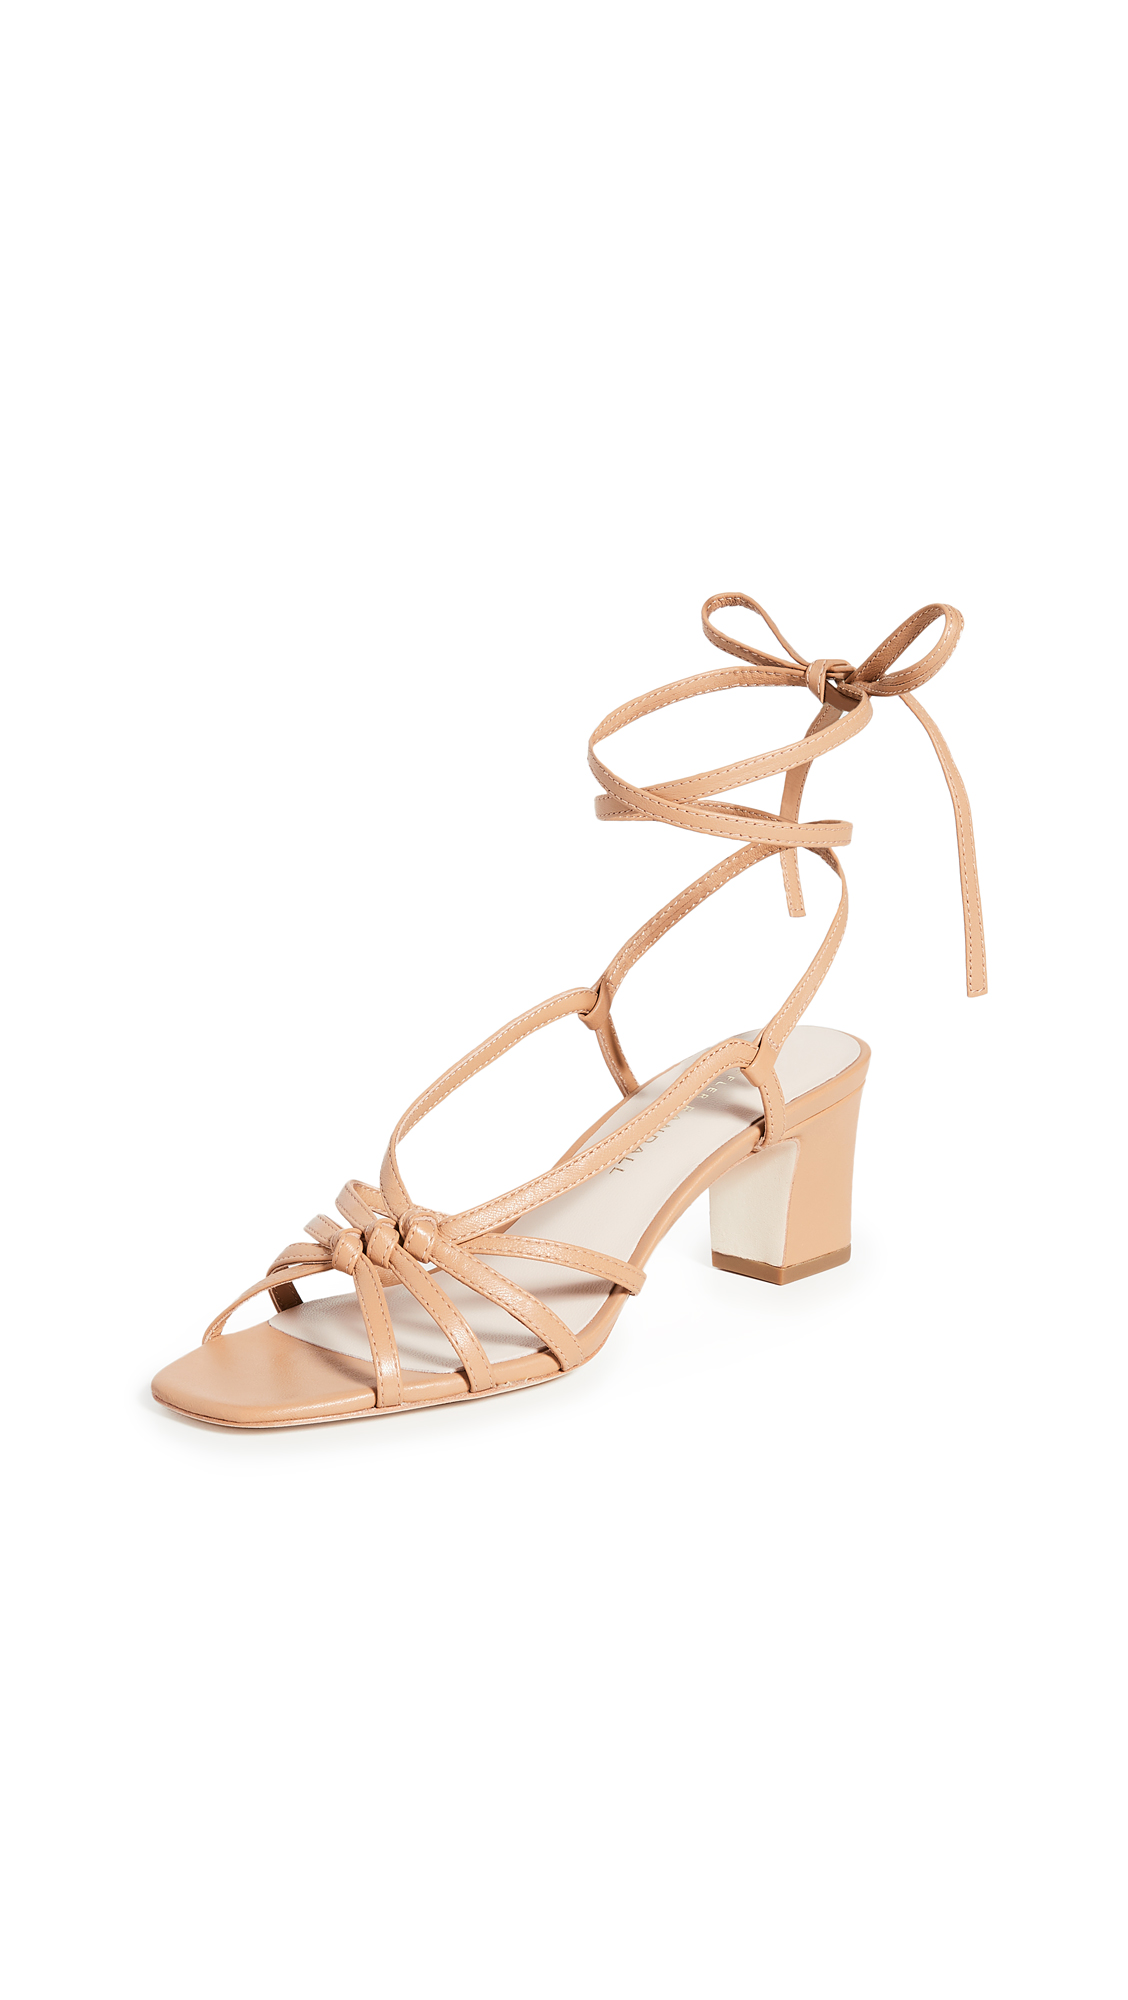 Buy Loeffler Randall Libby Knotted Wrap Heel Sandals online, shop Loeffler Randall